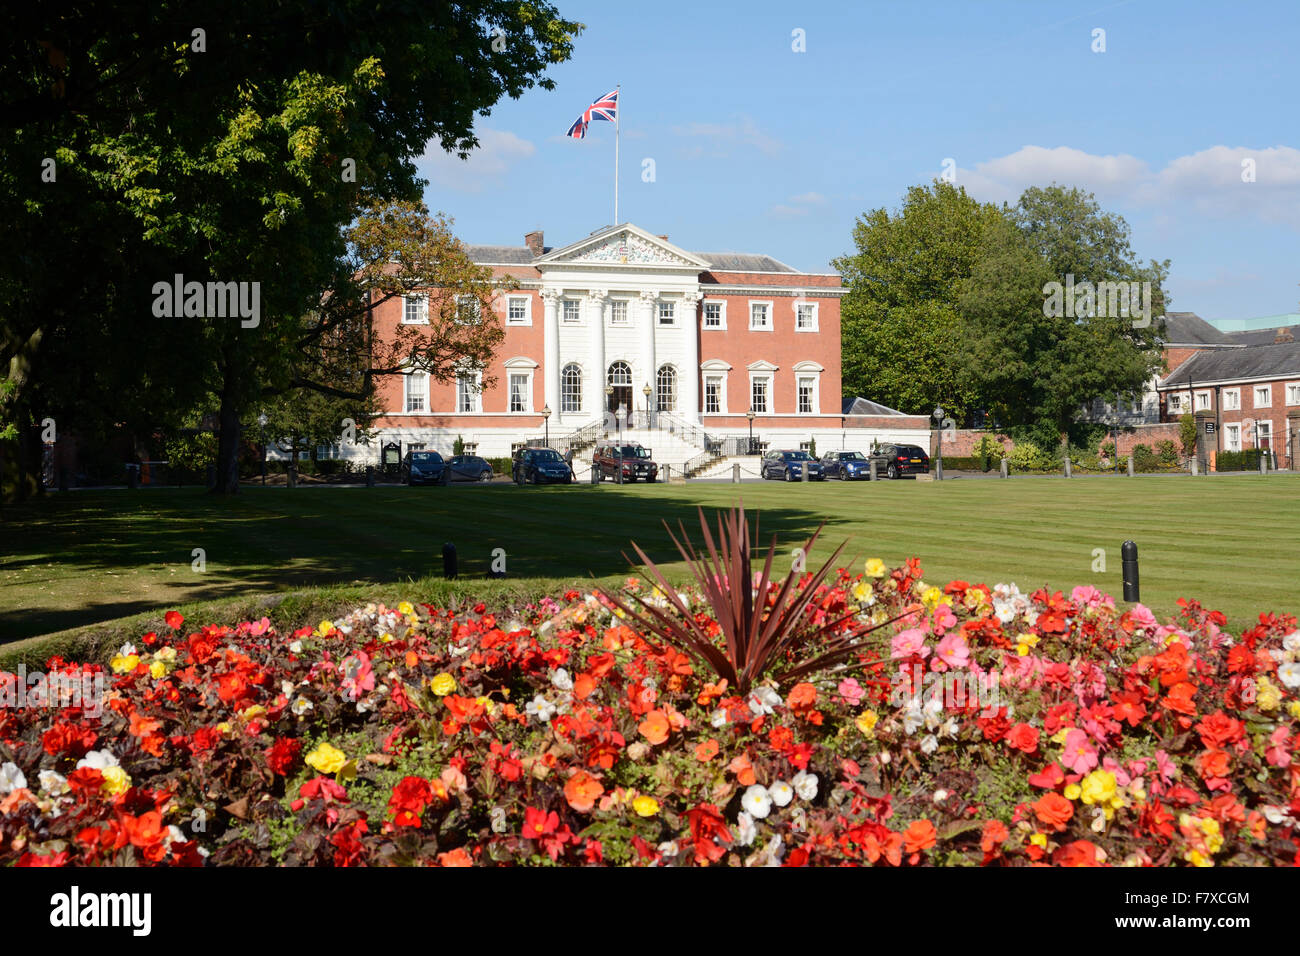 Warrington Town Hall, administrative centre for Warrington, Cheshire. Stock Photo